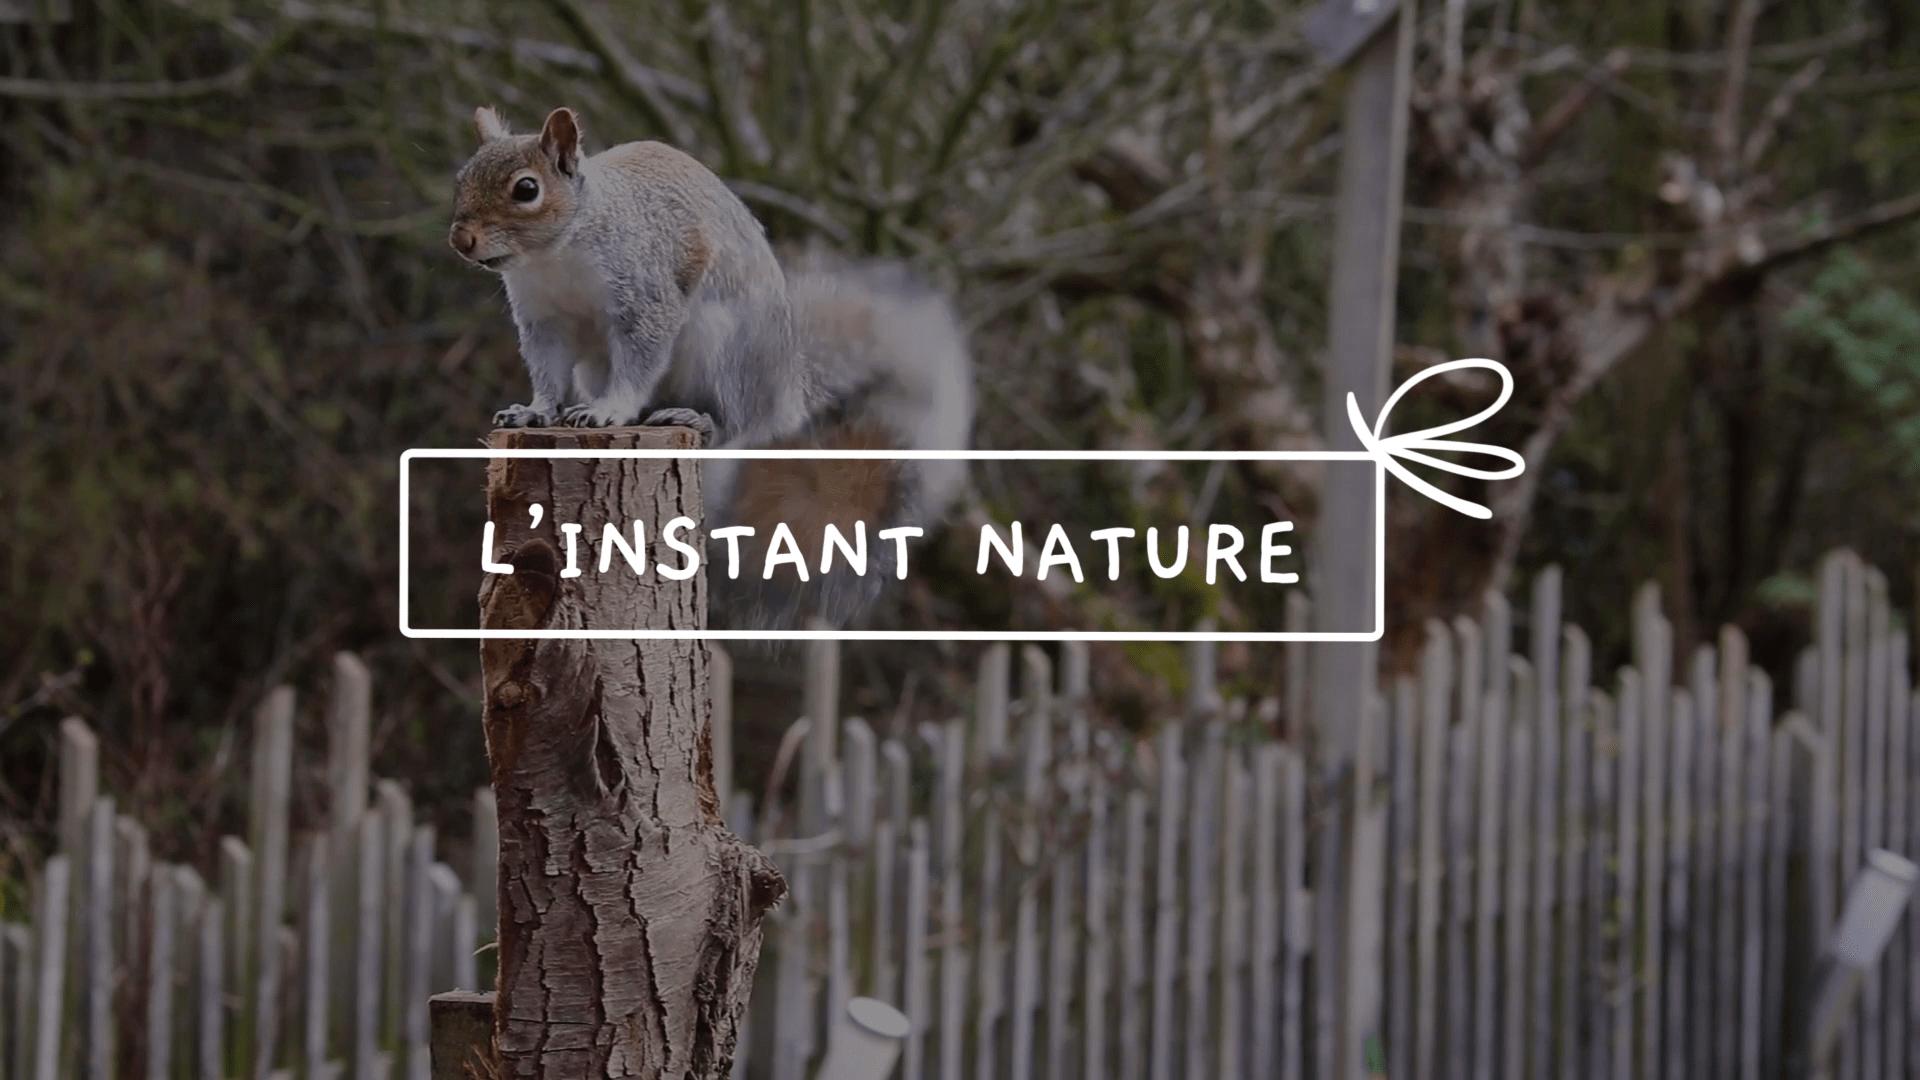 L'instant nature